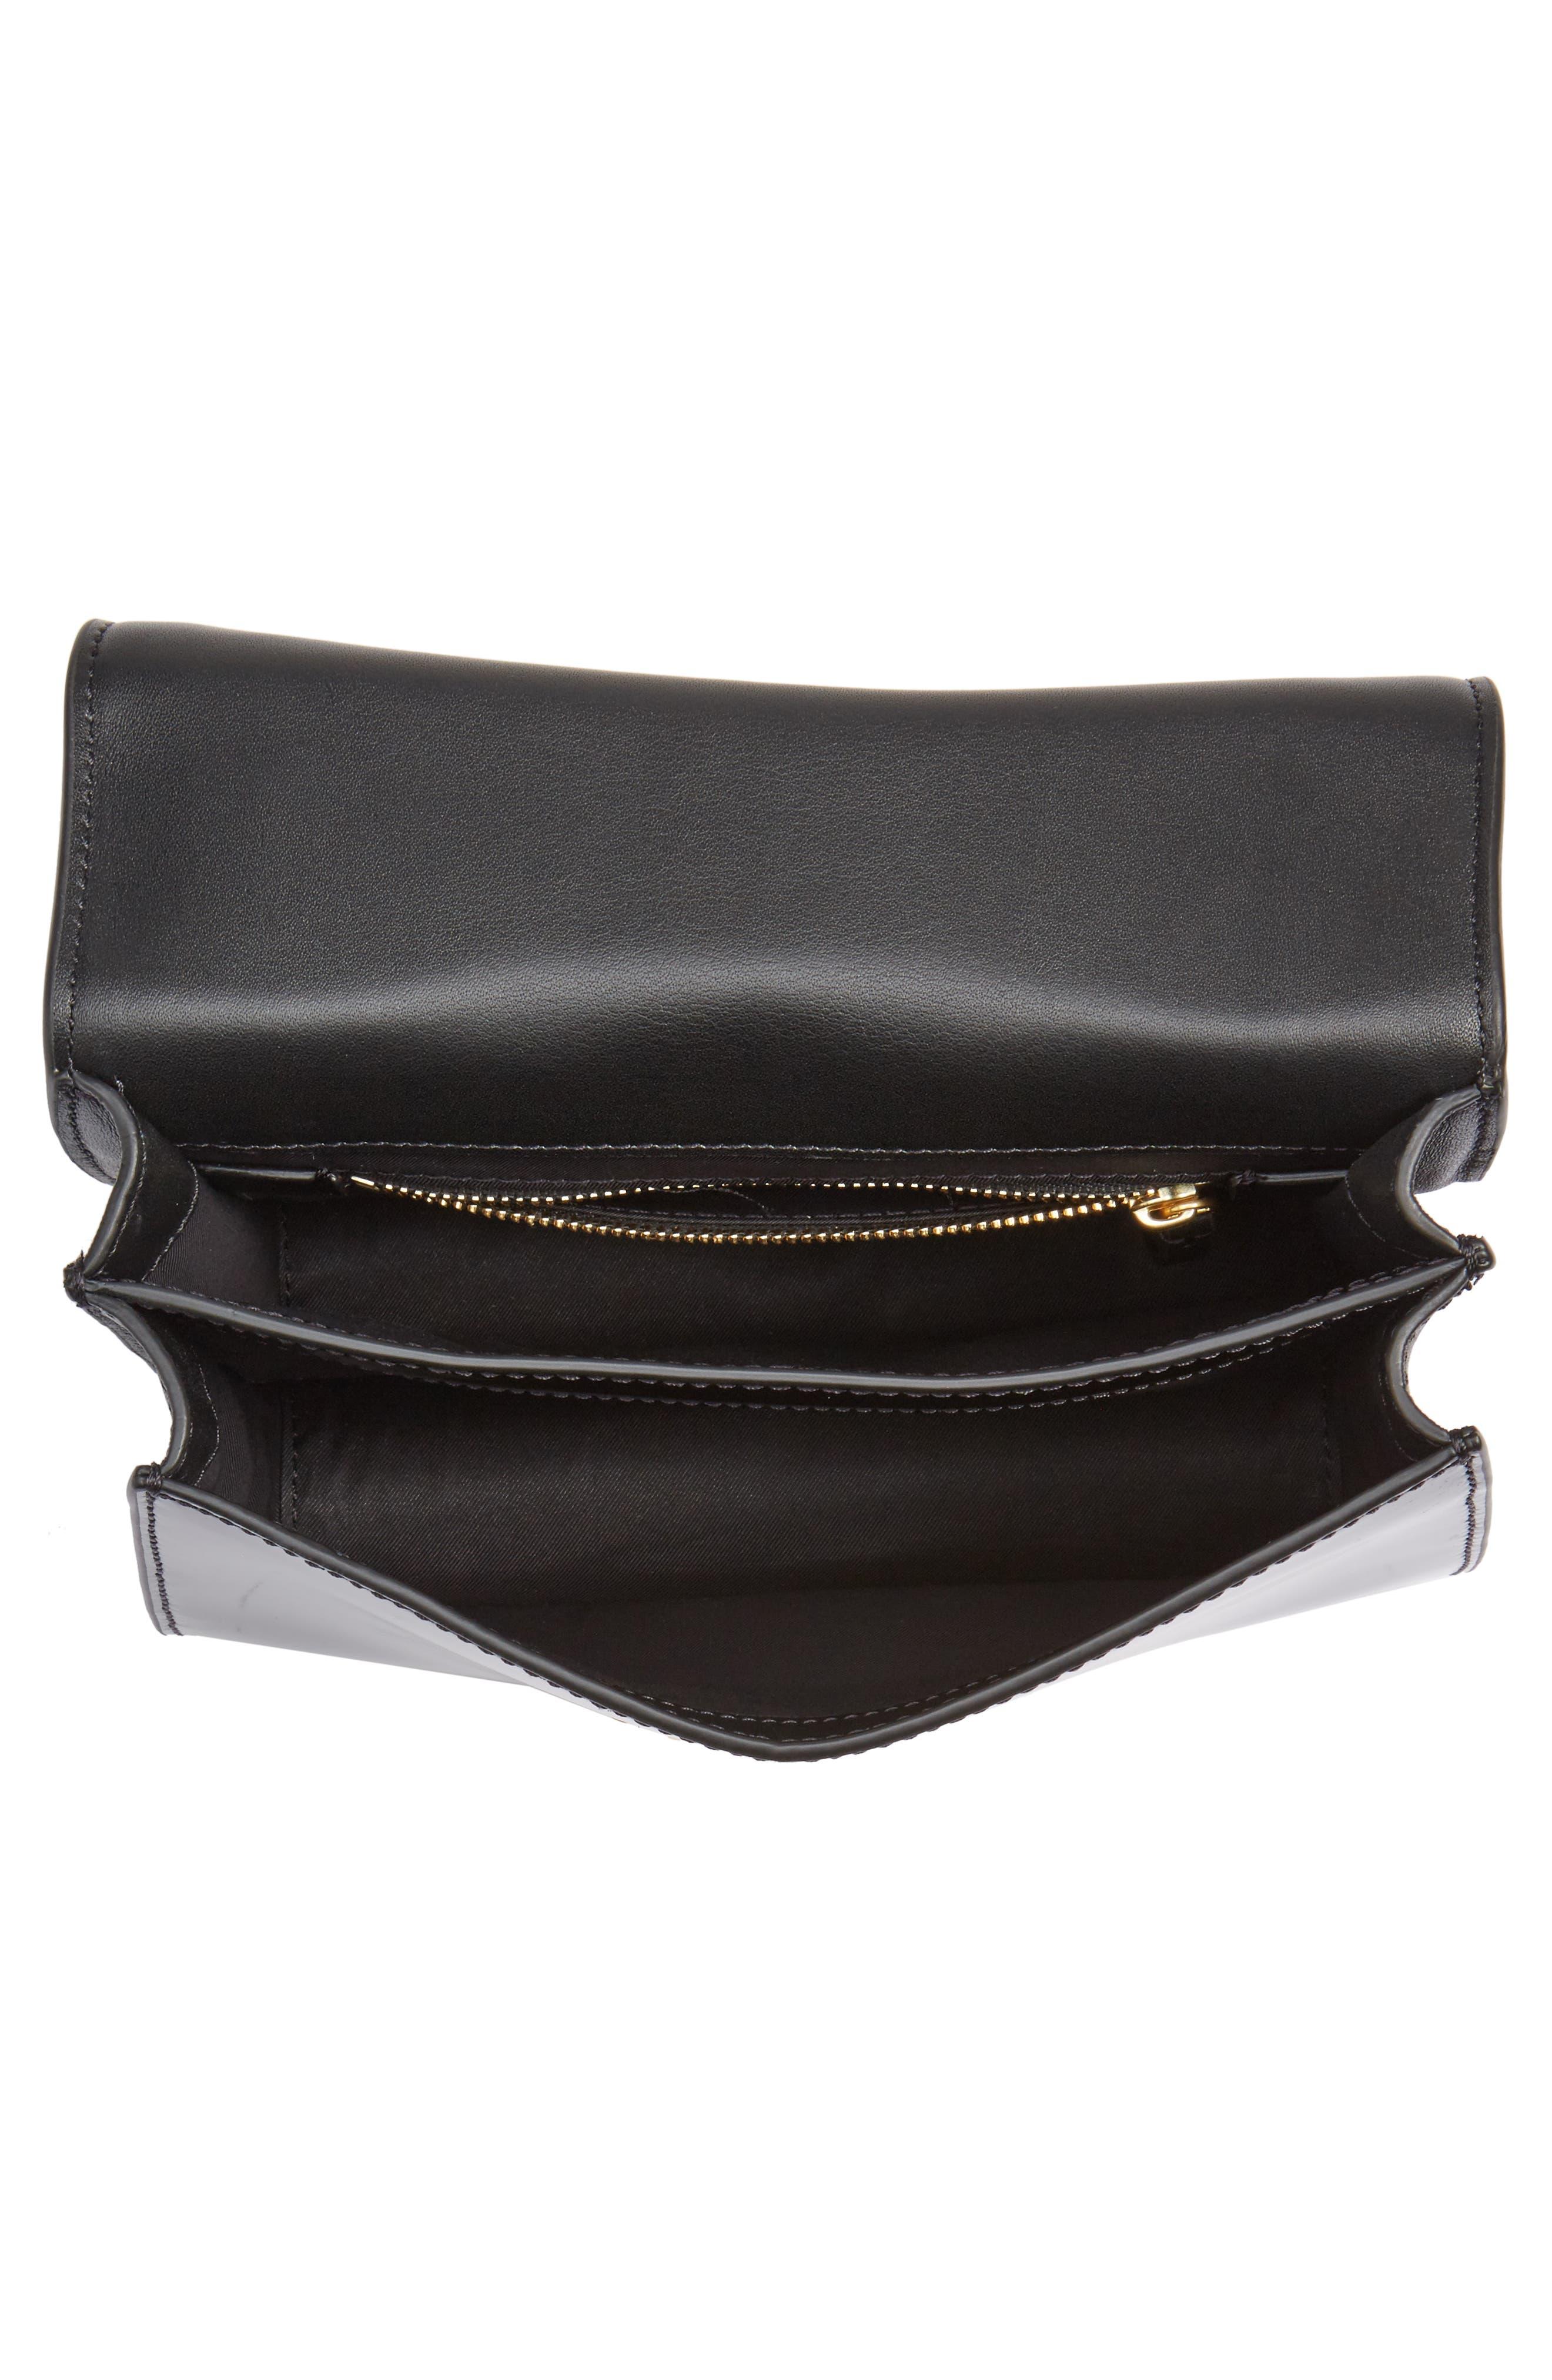 Alternate Image 3  - Tory Burch Mini Juliette Leather Top Handle Satchel